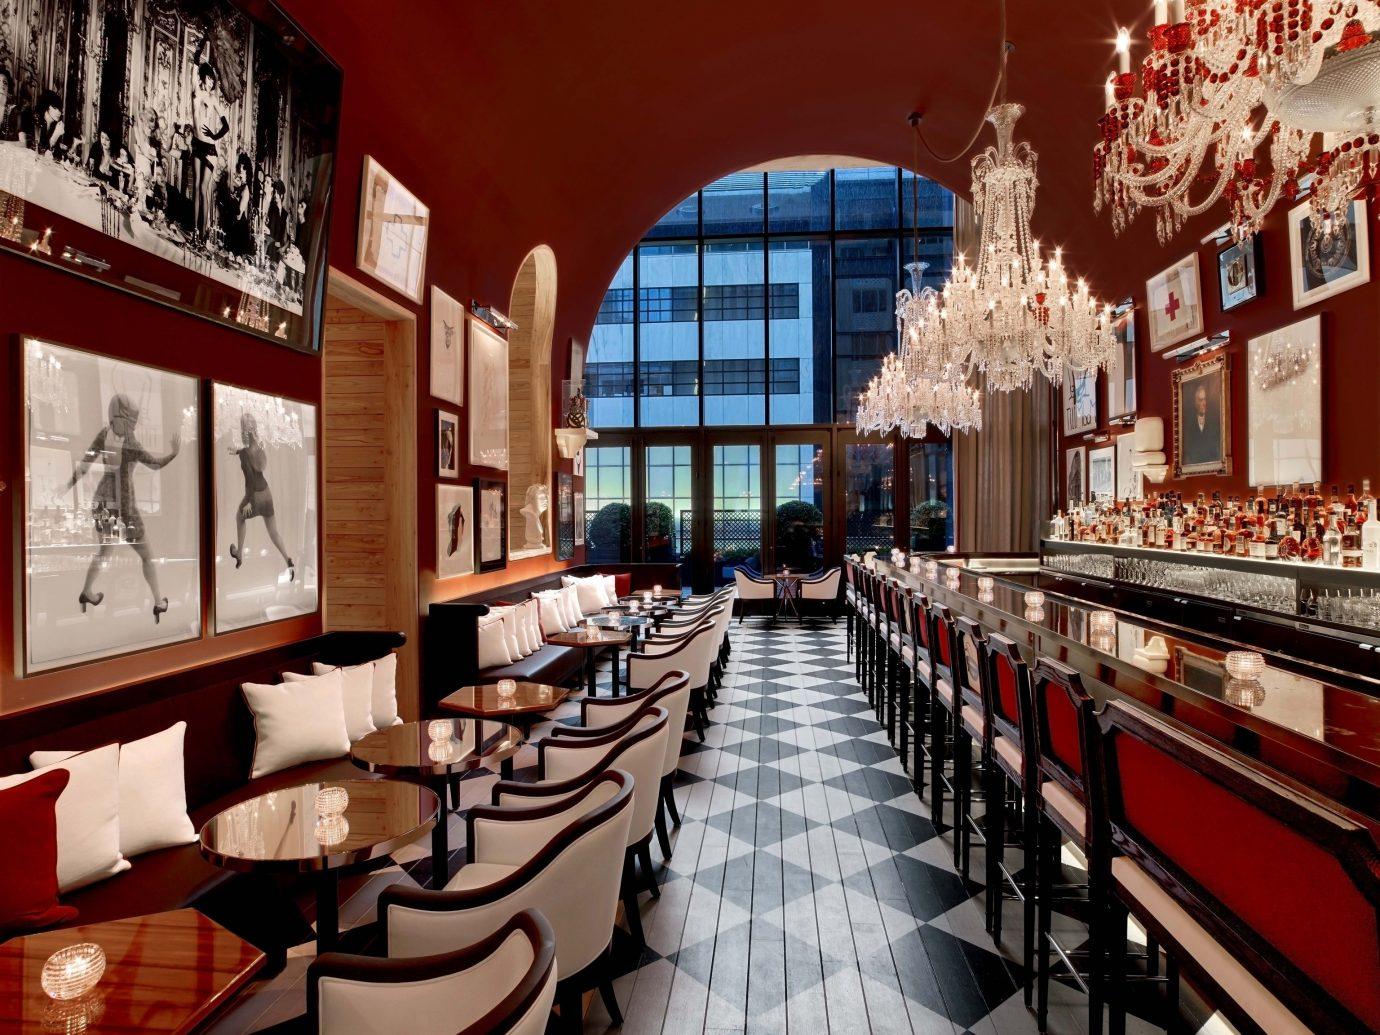 Baccarat Hotel & Residences, Best Hotels in NYC, restaurant meal interior design Bar café dining room